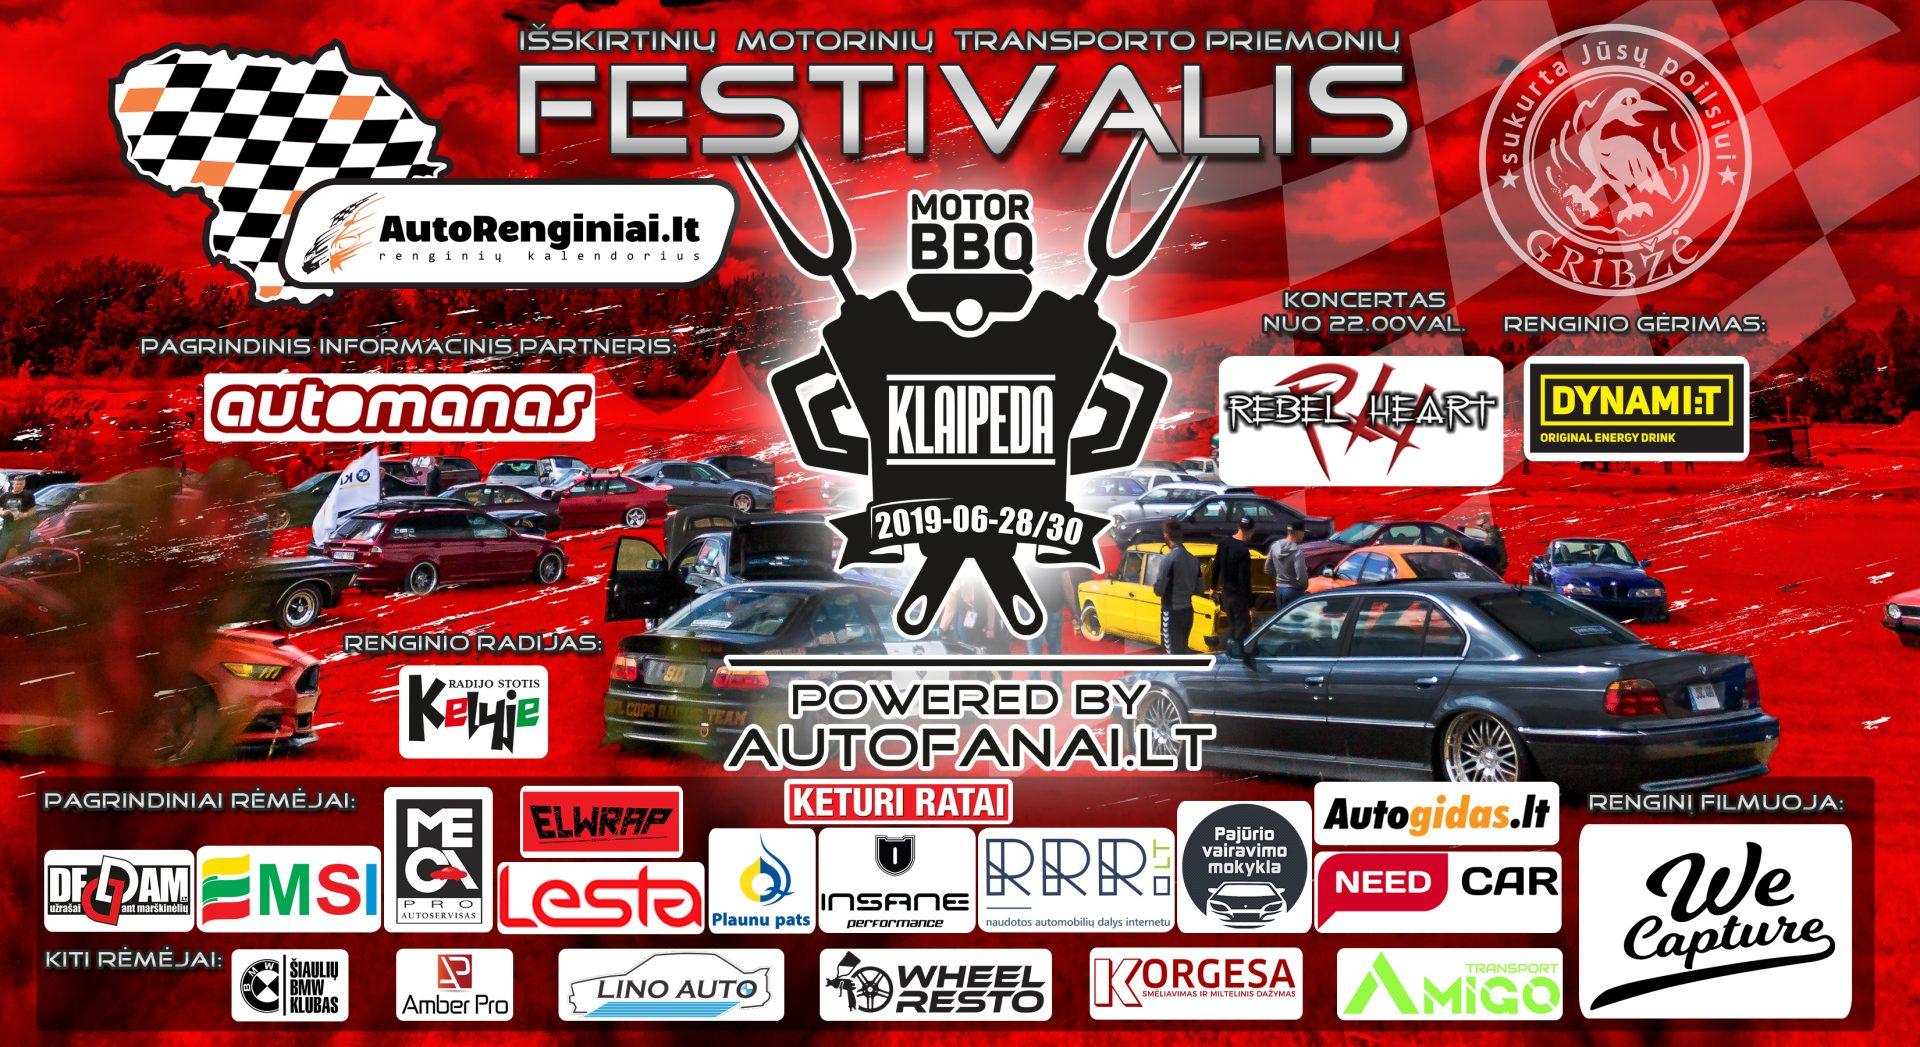 Klaipėda Motor BBQ 2019 powered by Autofanai.lt